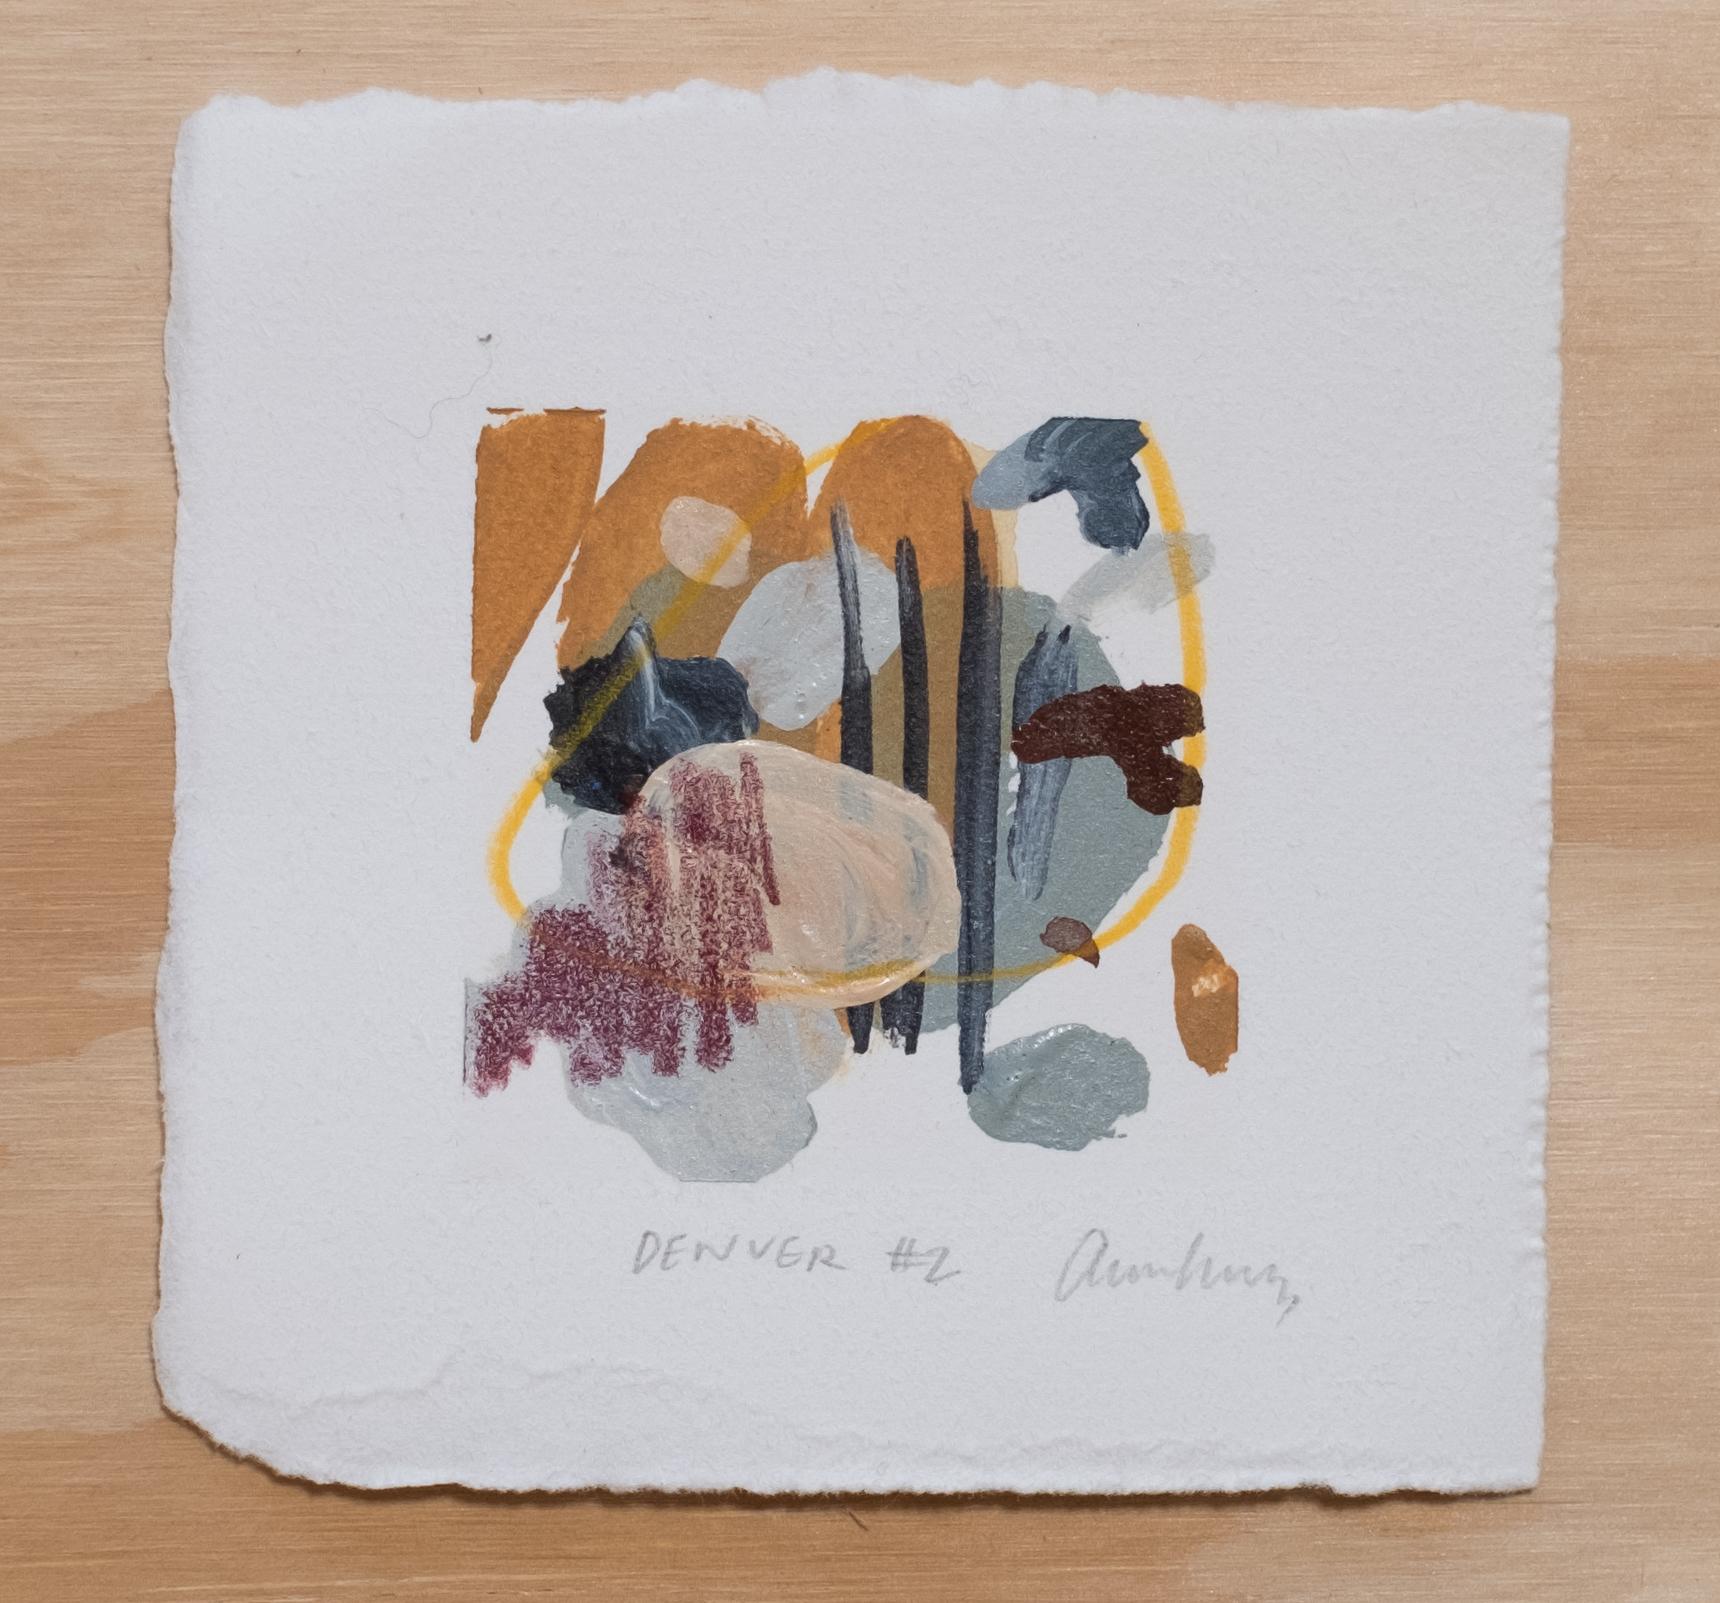 "Denver #2 / 4.5"" x 4.5"" / watercolor, acrylic paint and chalk pastel on cotton paper"